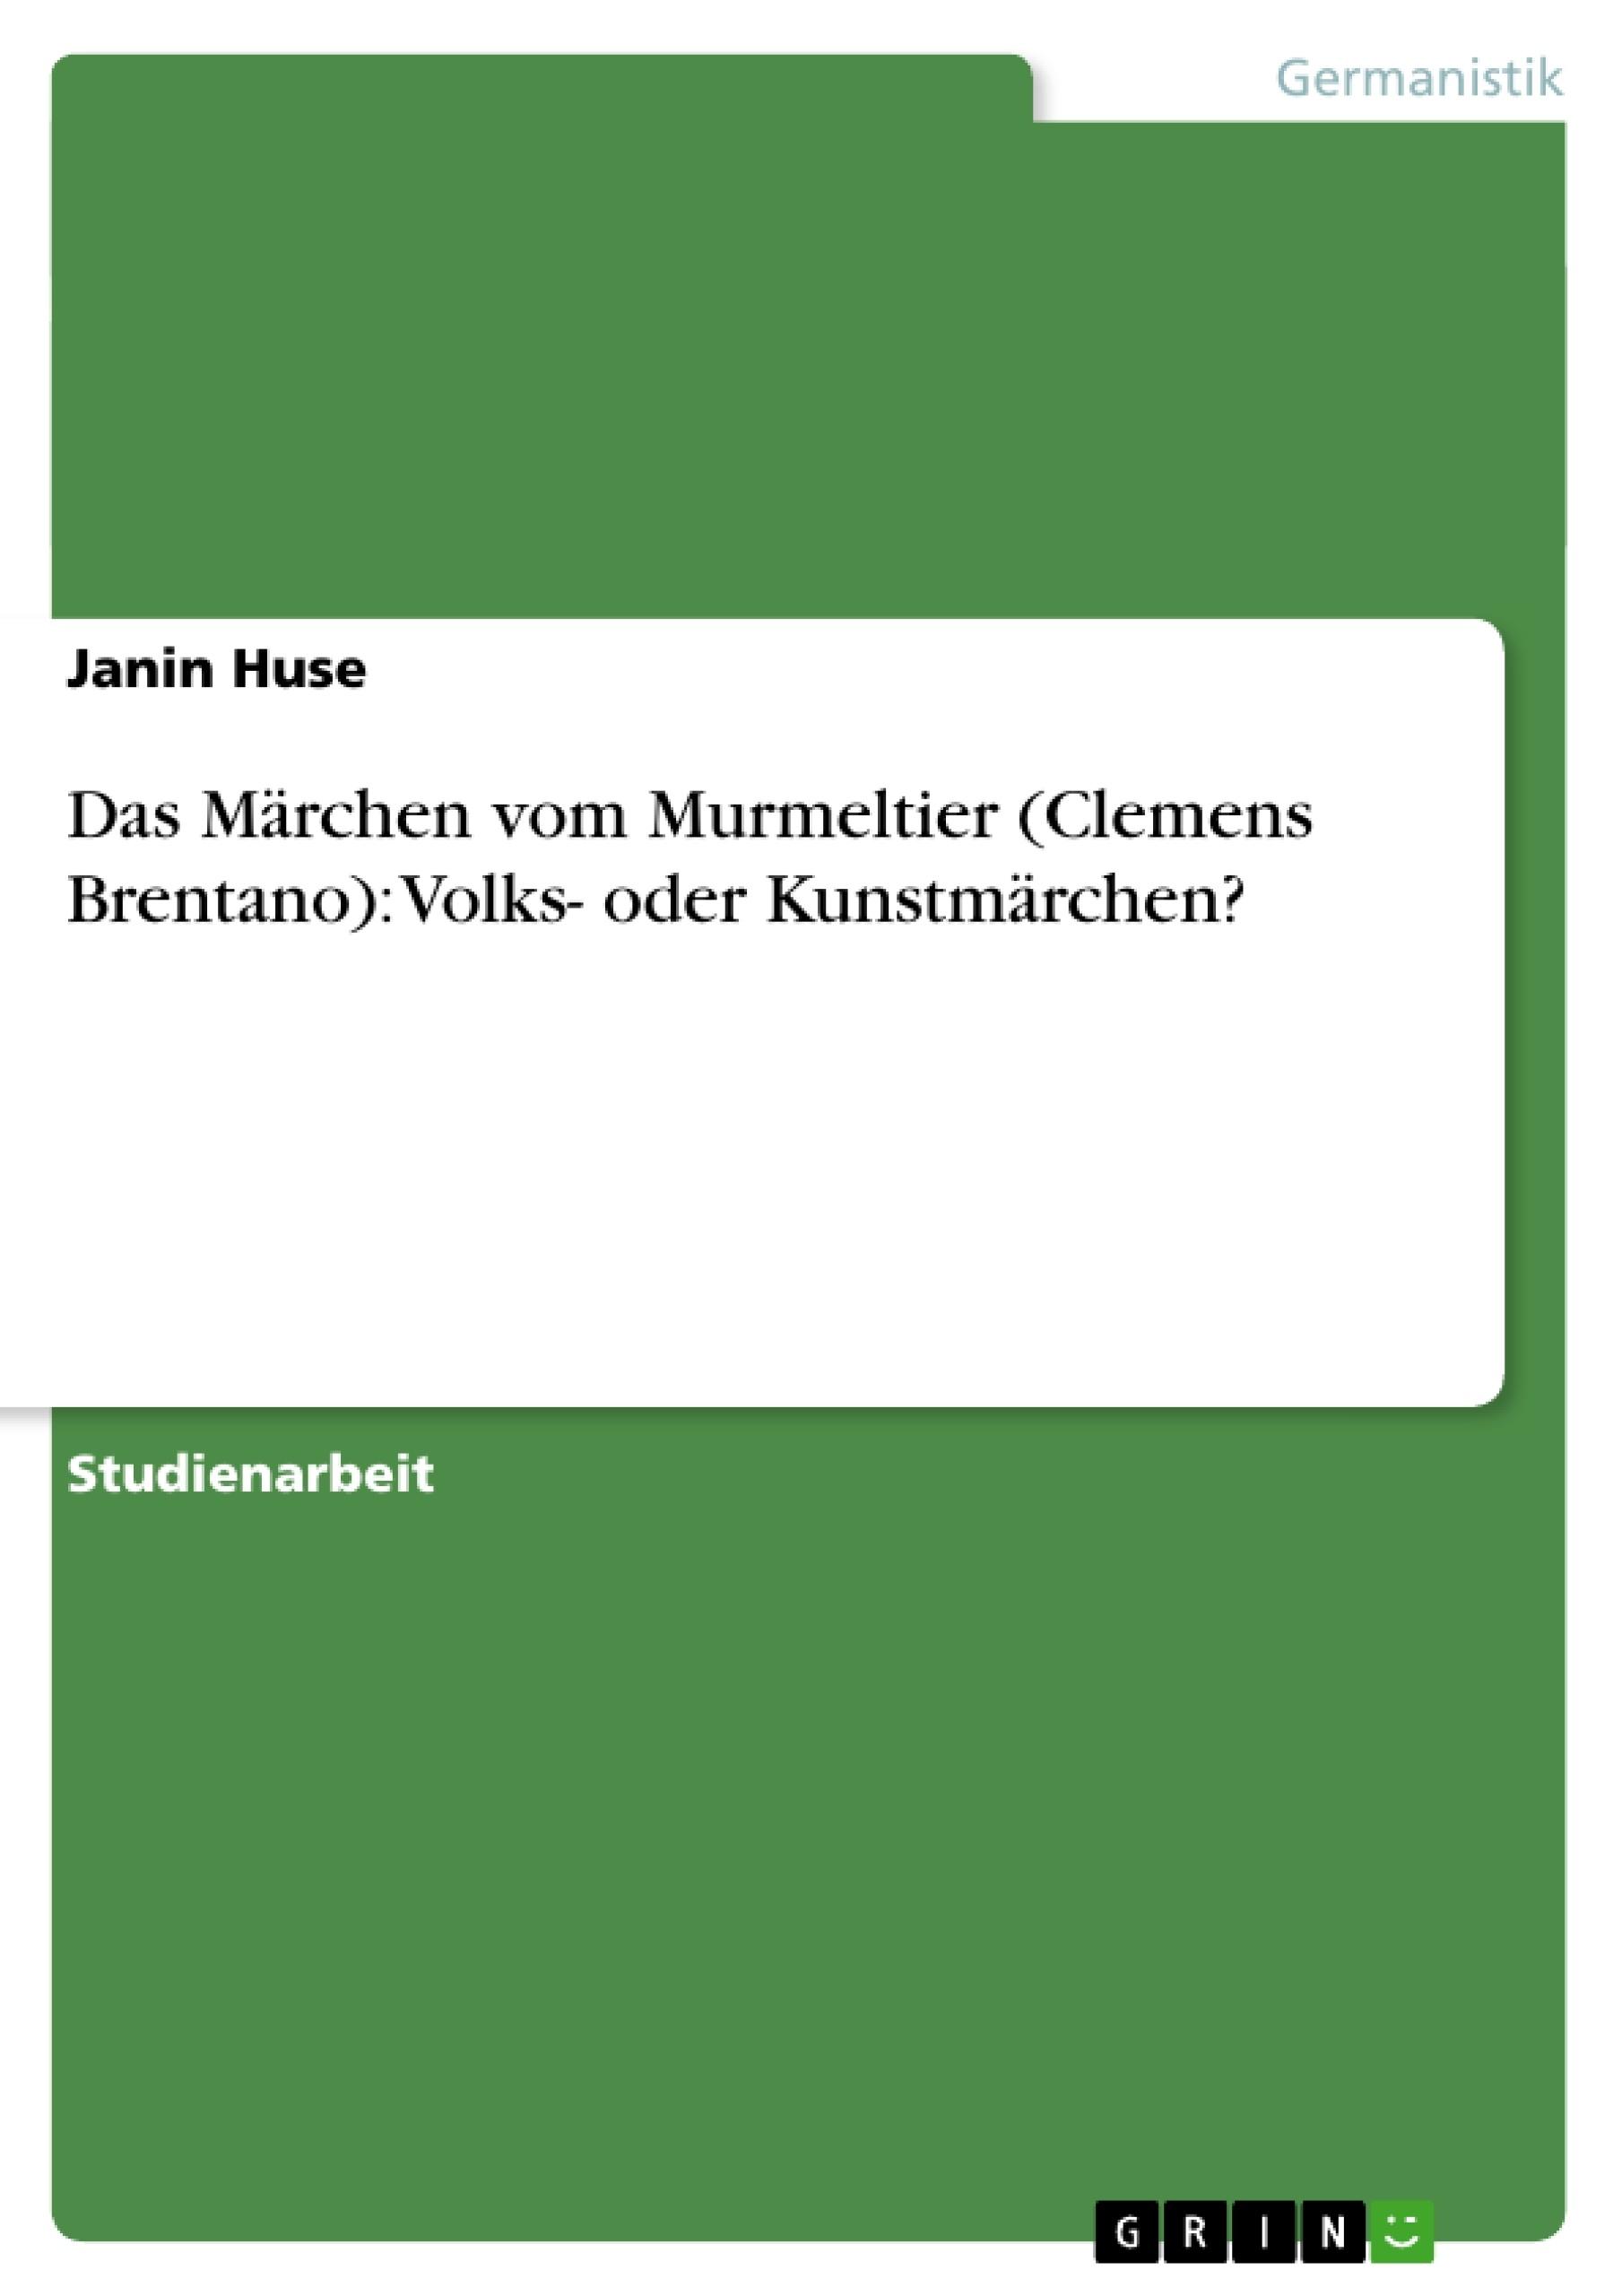 Titel: Das Märchen vom Murmeltier (Clemens Brentano): Volks- oder Kunstmärchen?